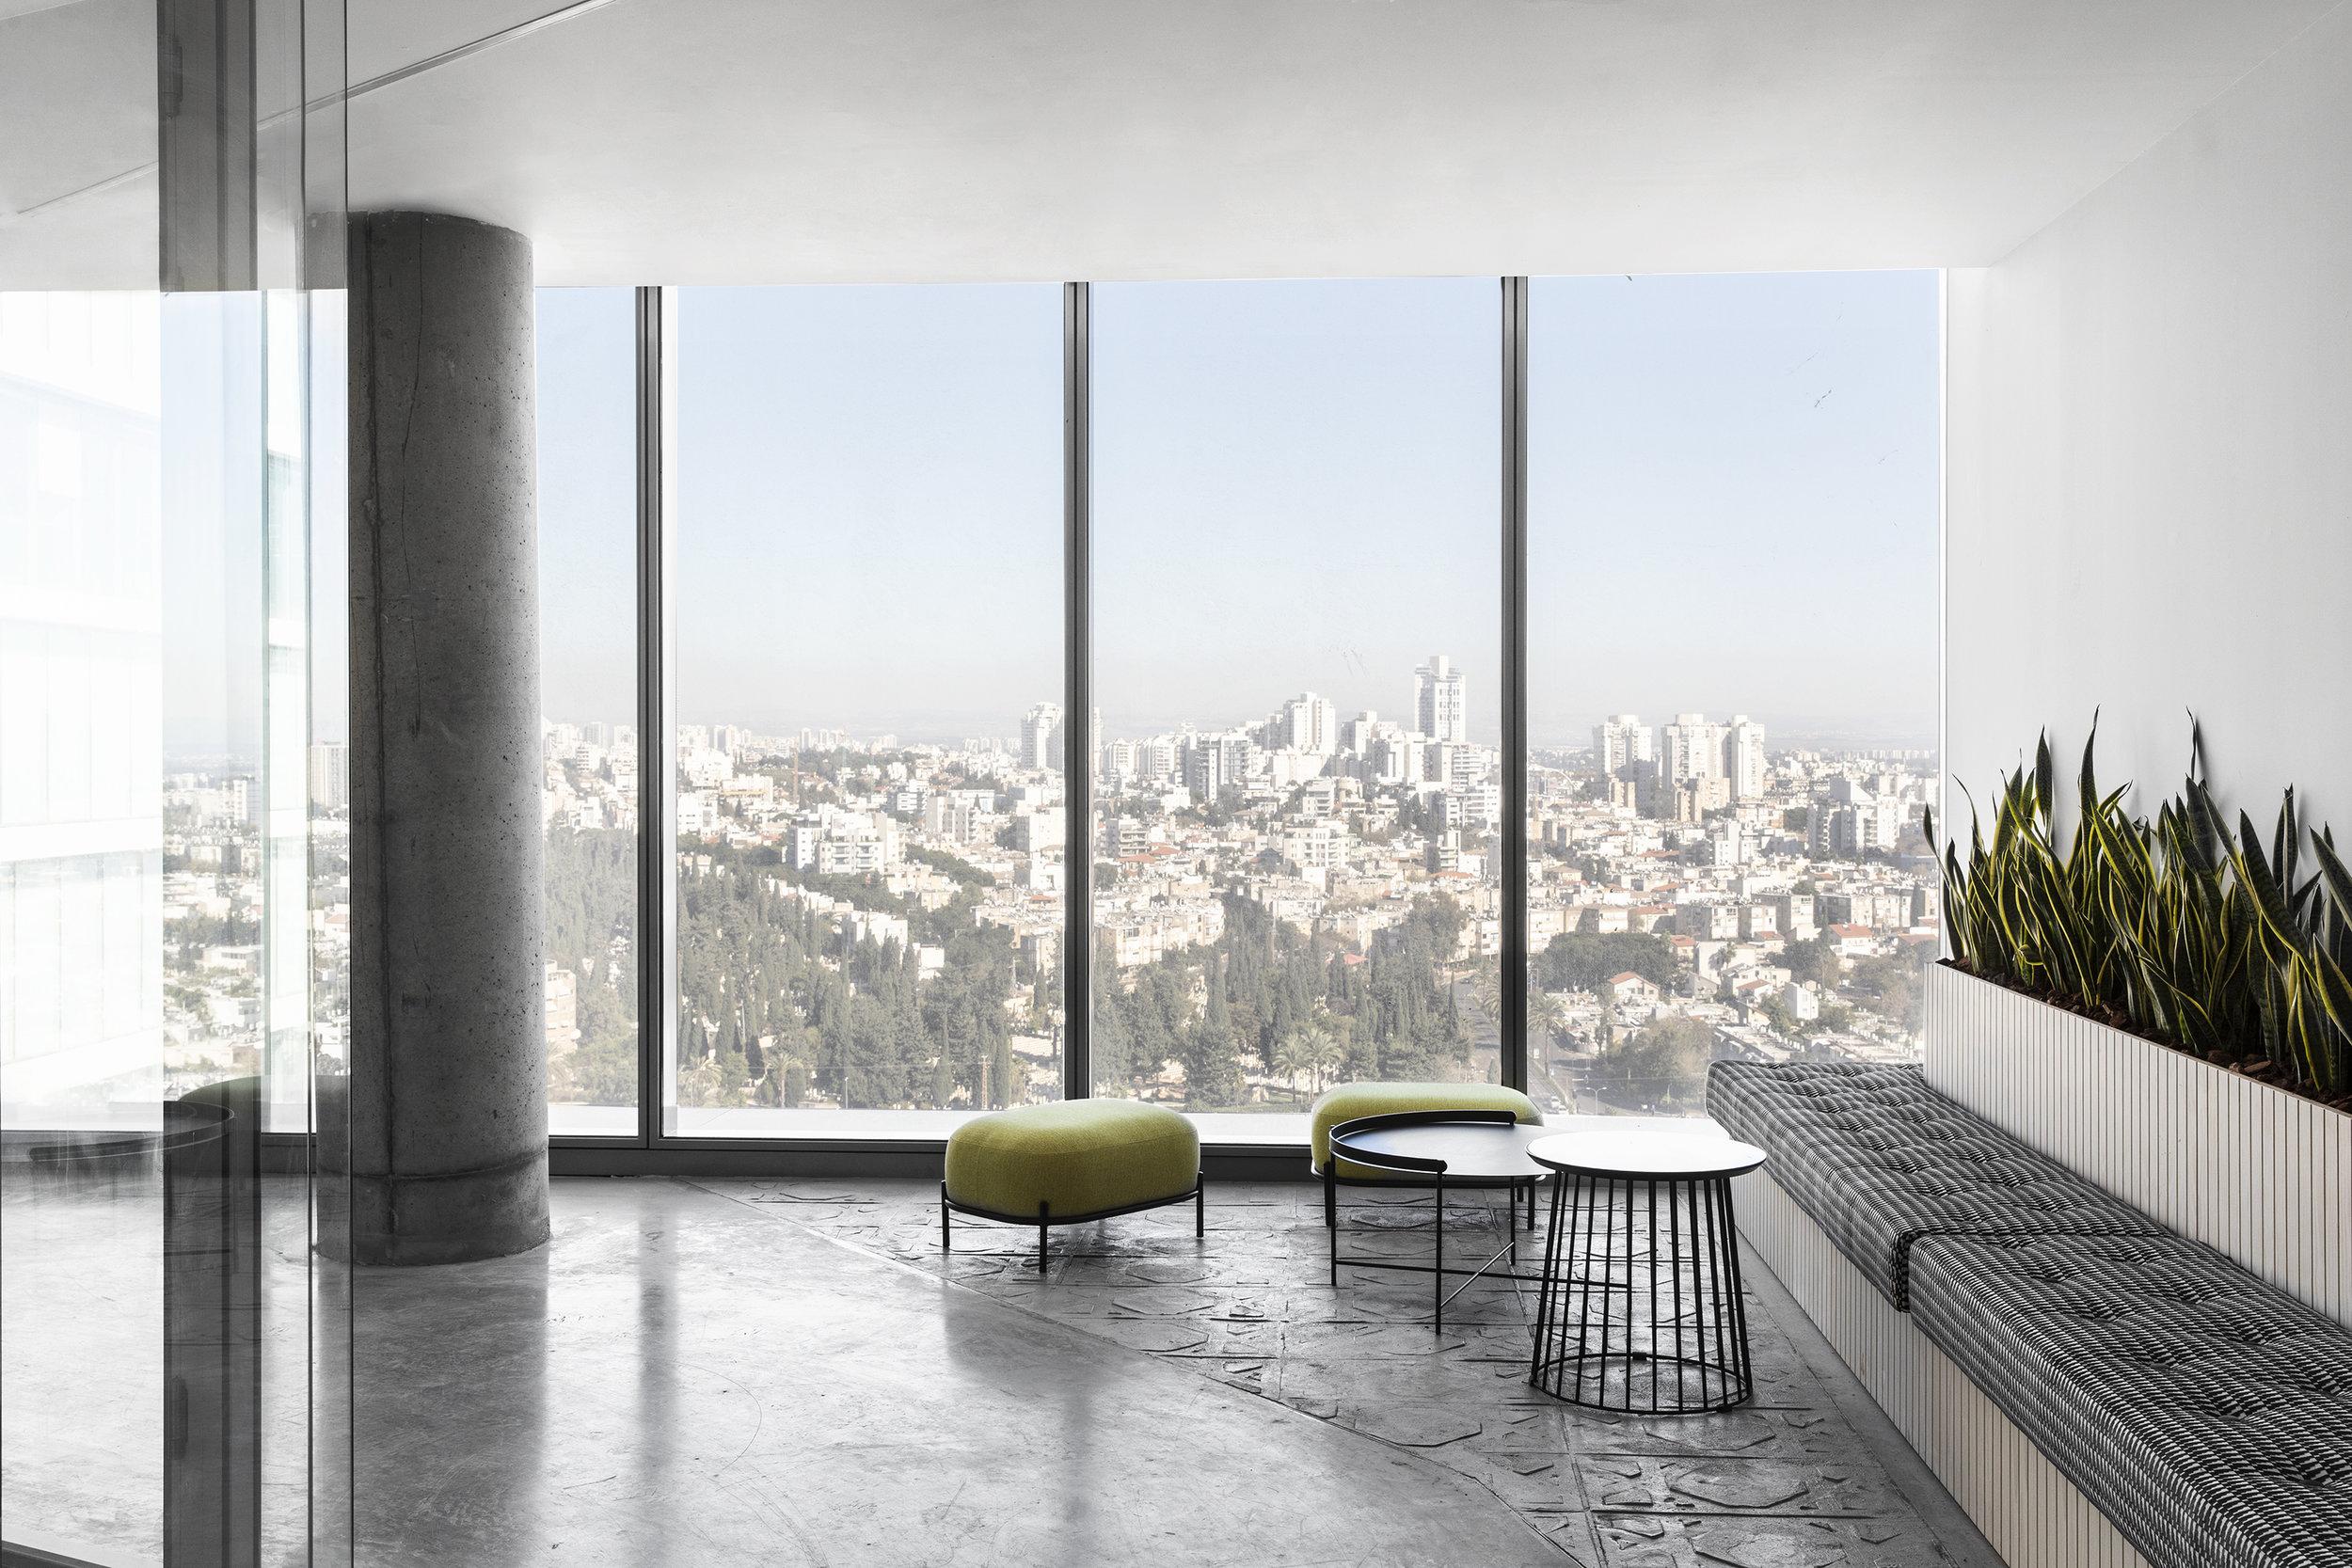 רואי דוד אדריכלות - אדריכל - נטורל אינטליג'נס - ROY DAVID - ARCHITECTURE - ARCHITECT - NI (101).jpg